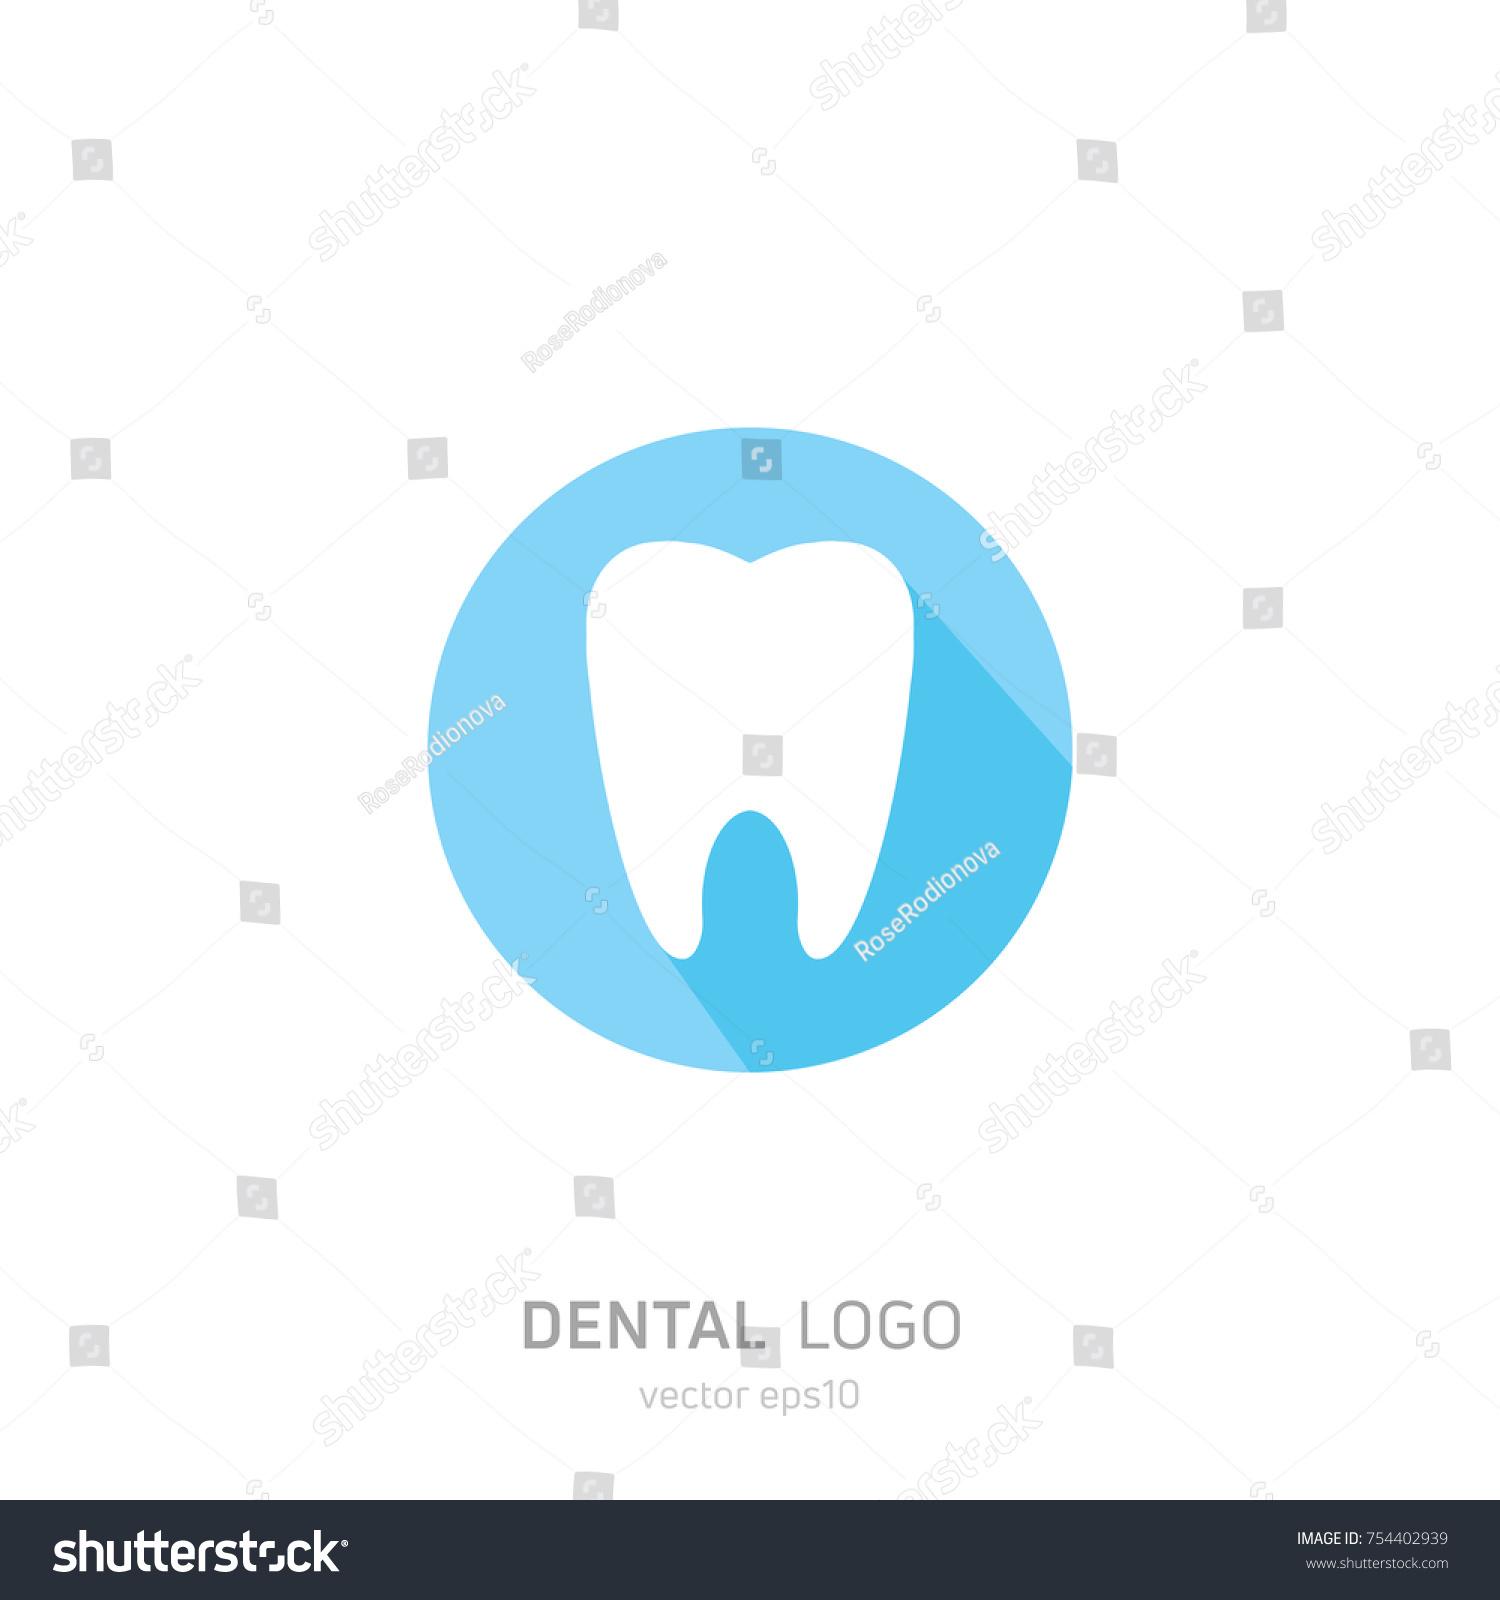 dental office logo